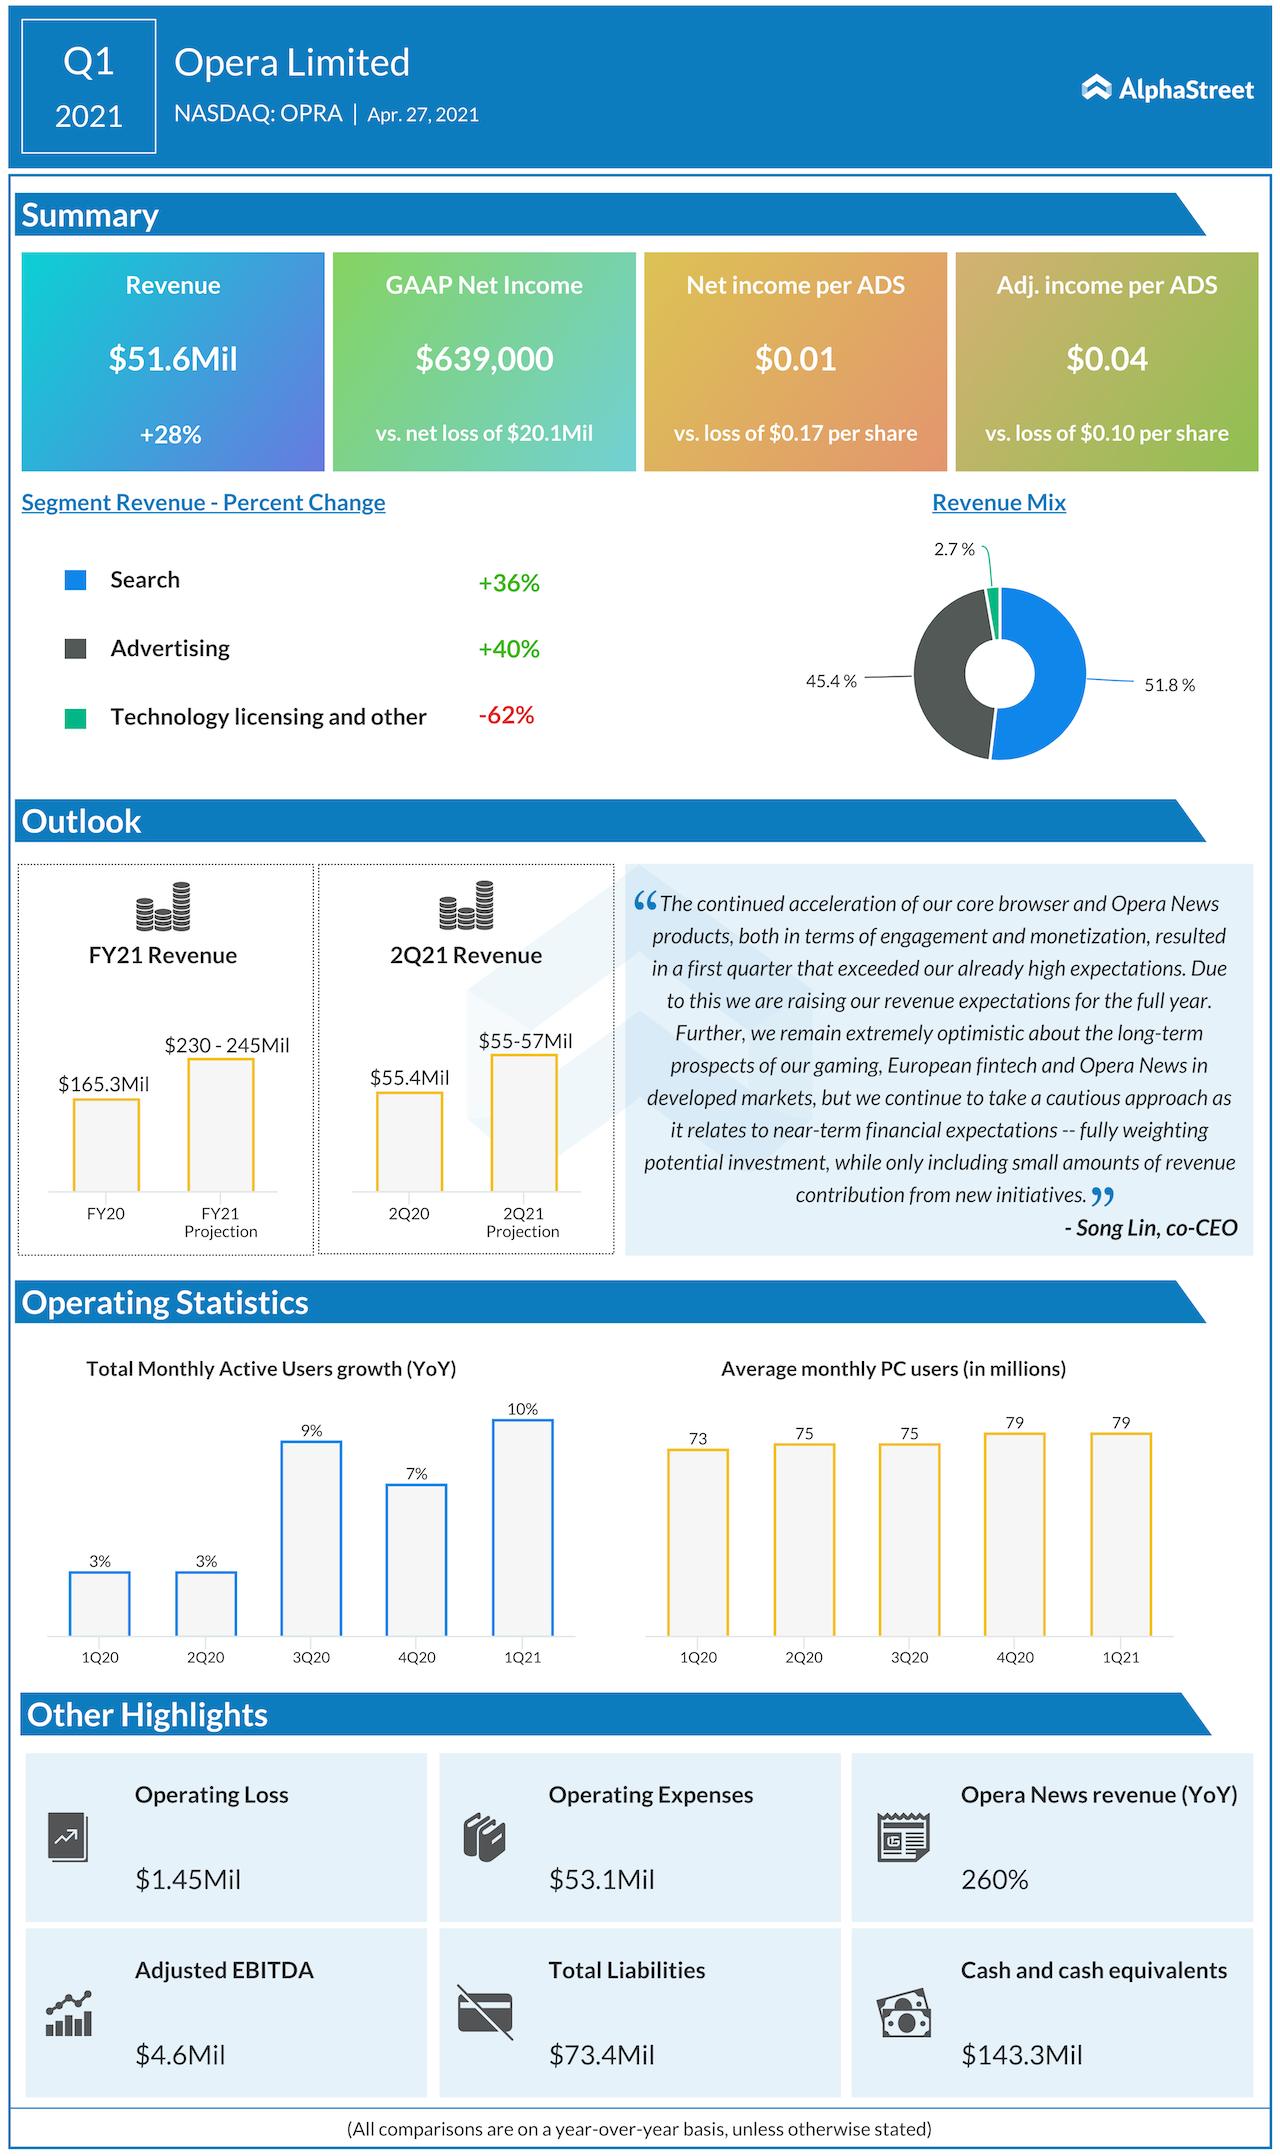 Opera Ltd Q1 2021 earnings